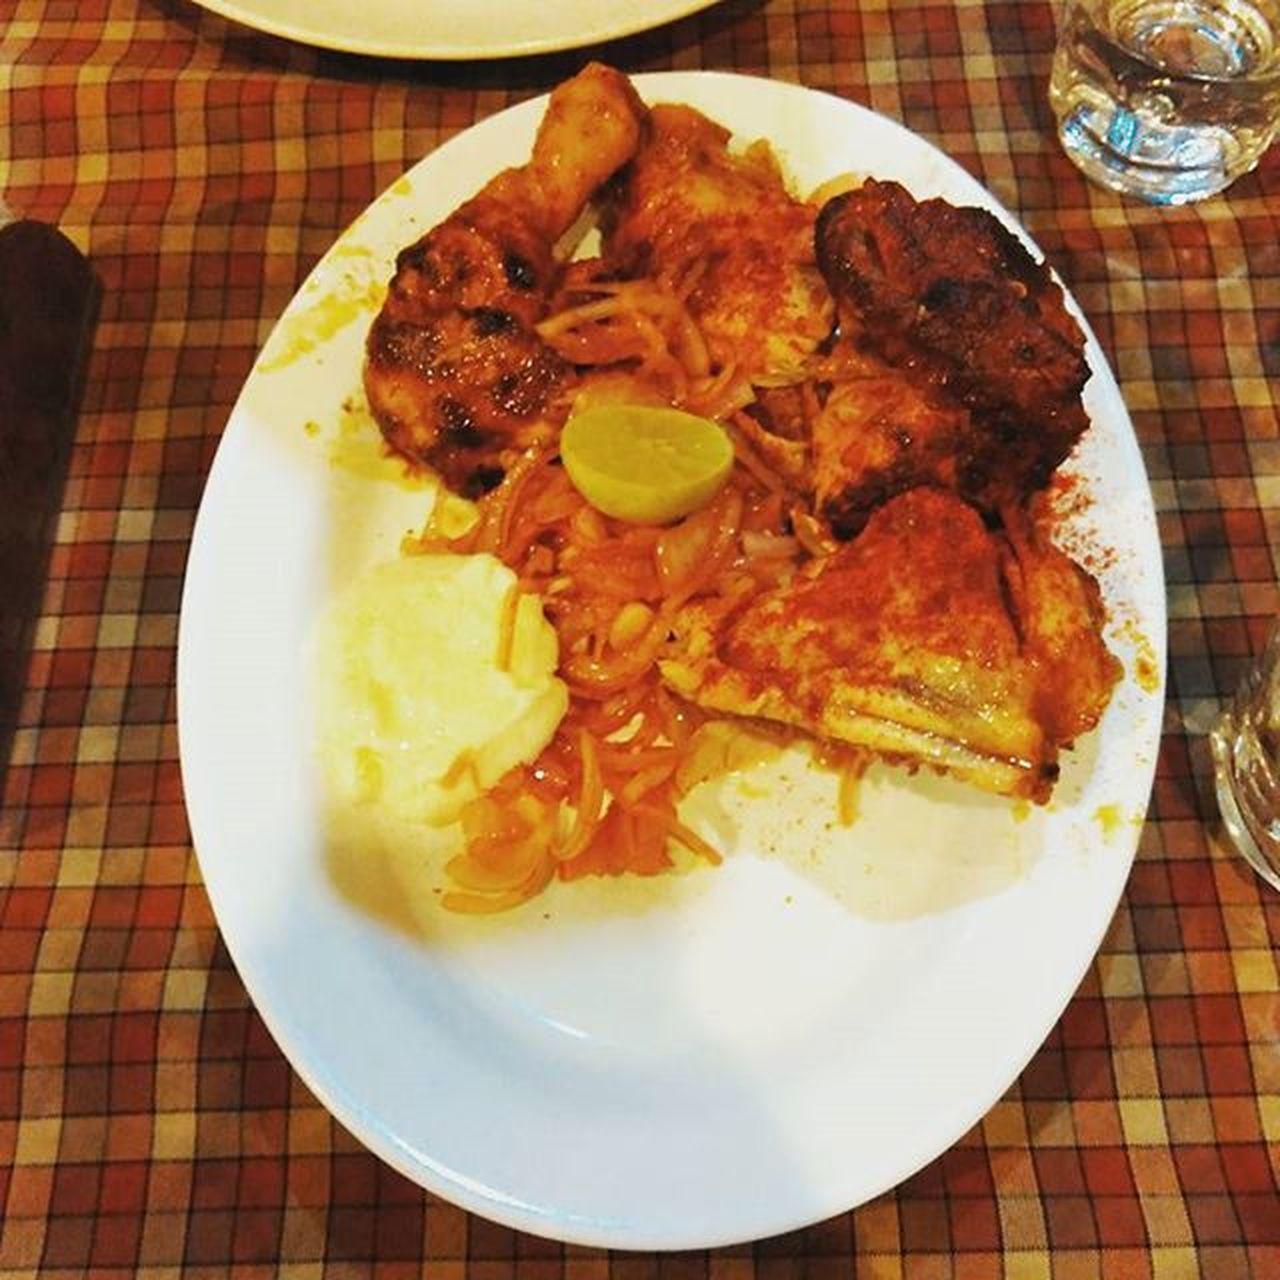 Dinner Chickengrill Newyear2016 Igfood BrigadeRoad Bangalore Bangalorediaries Foodie Ig_bangalore Ig_india